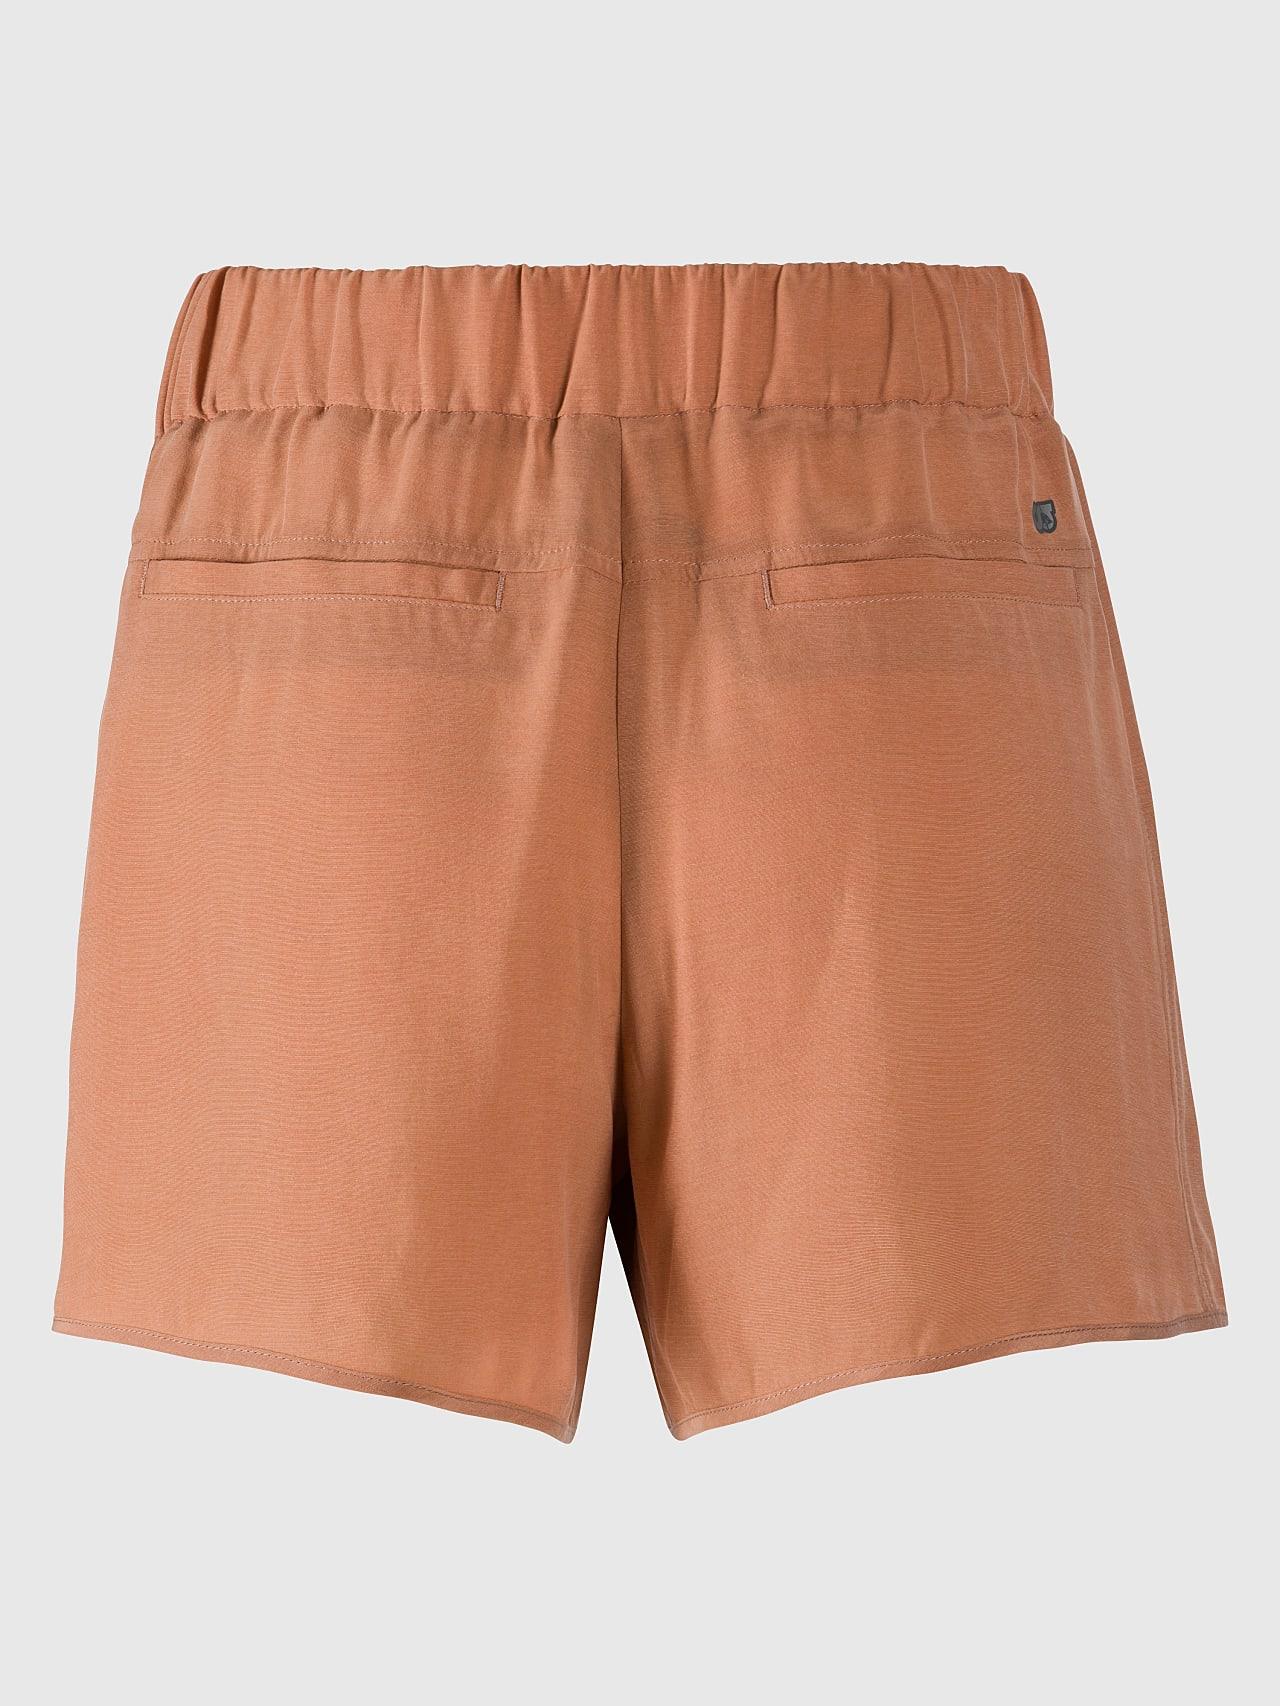 PHORT V1.Y5.01 Relaxed Cupro Shorts rose Left Alpha Tauri